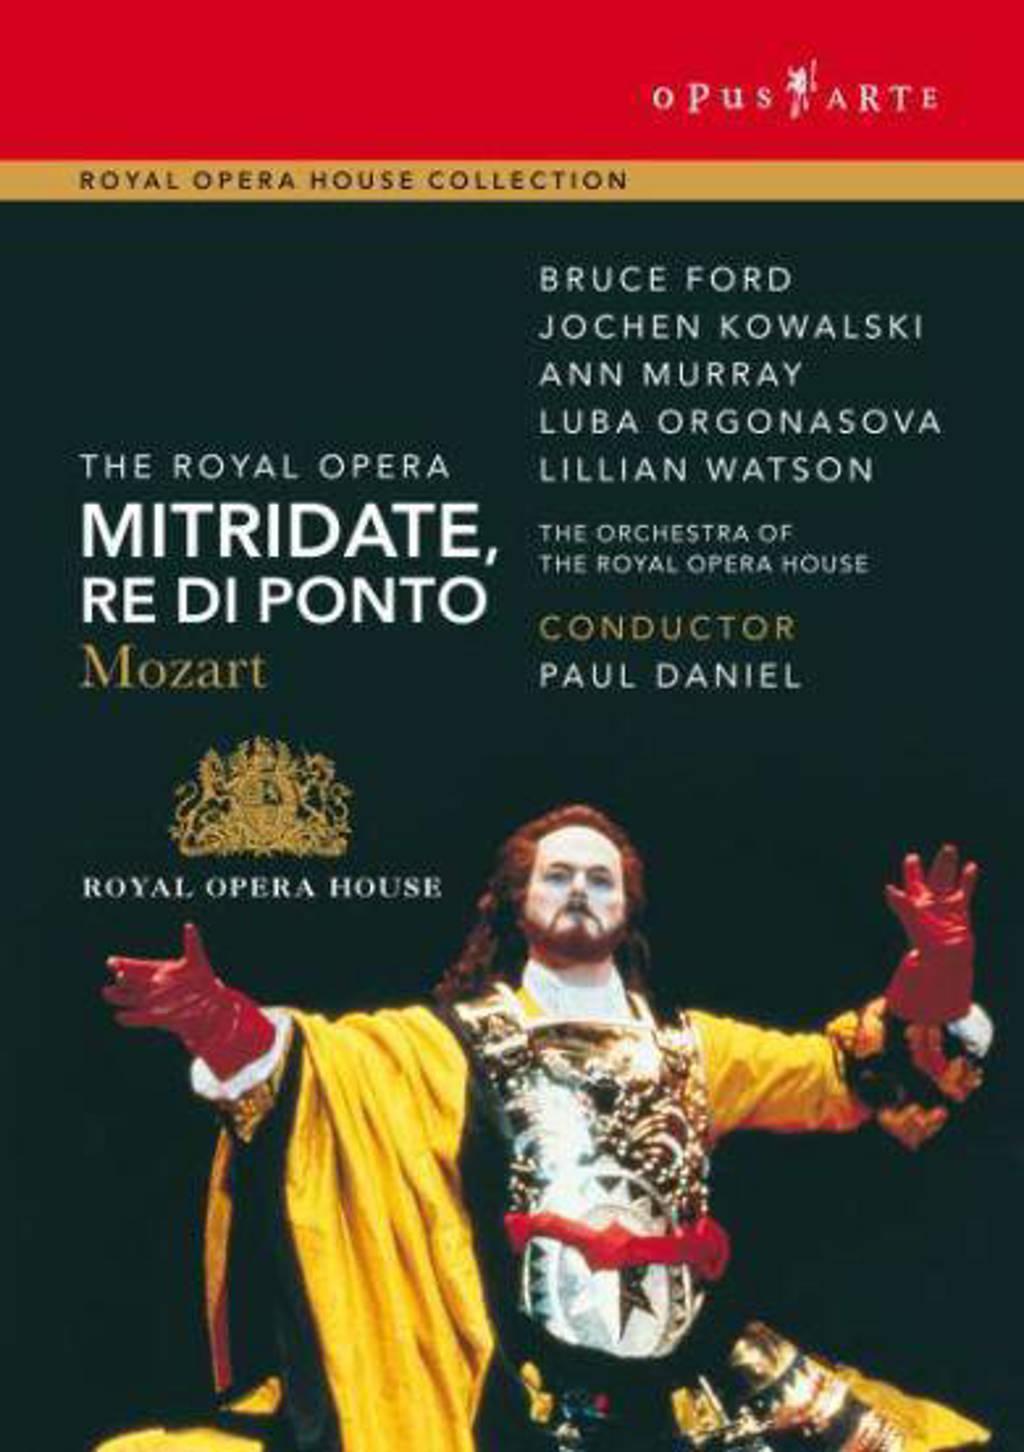 Ford/Kowalski/Murray/Royal Opera Ho - Mitridate Re Di Ponto (DVD)